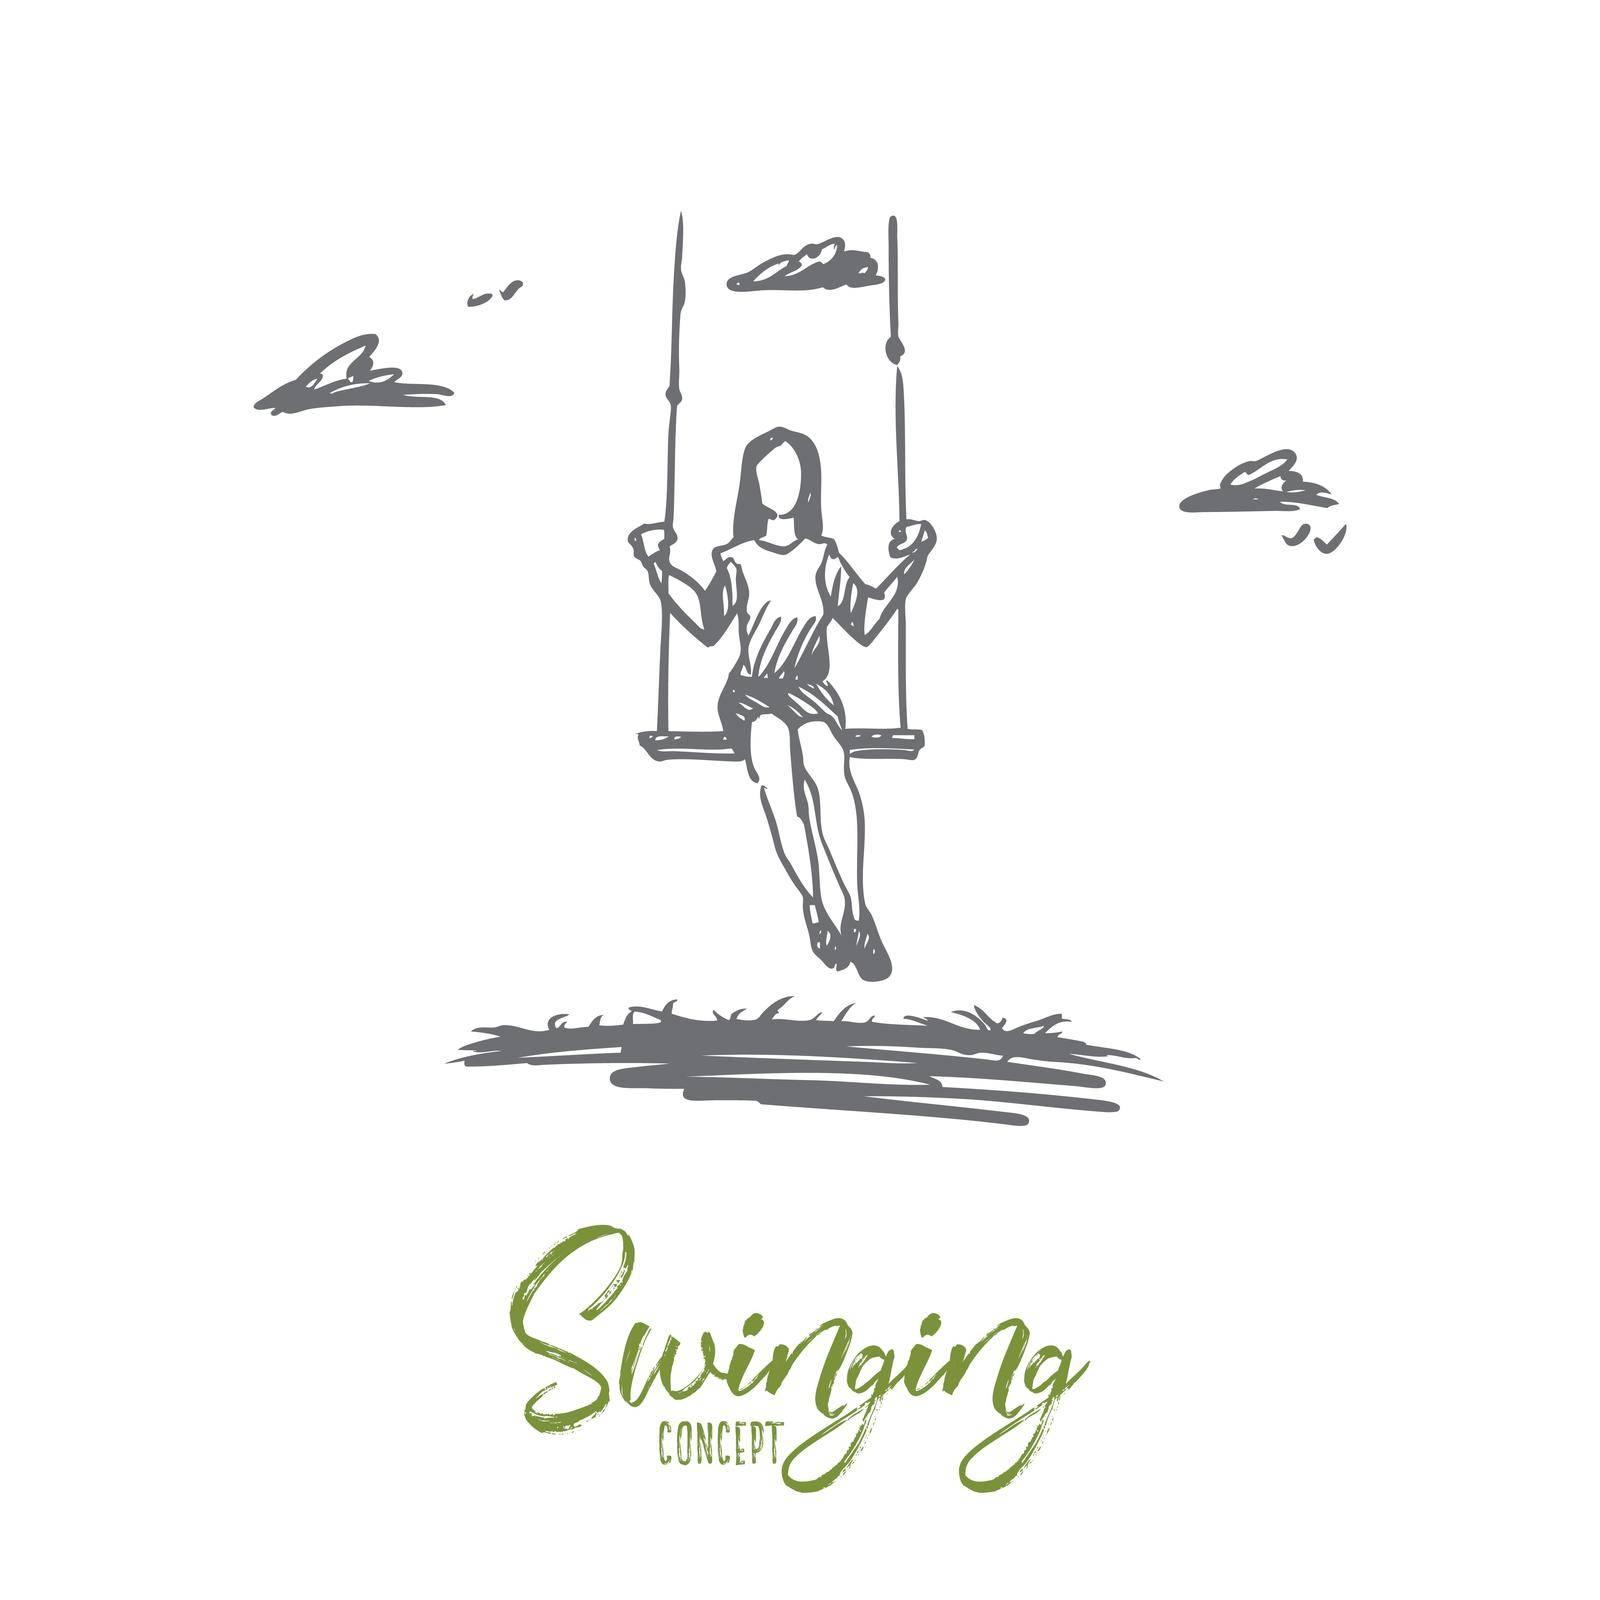 Girl, swinging, playing, fun, activity concept. Hand drawn isolated vector. by Vasilyeva